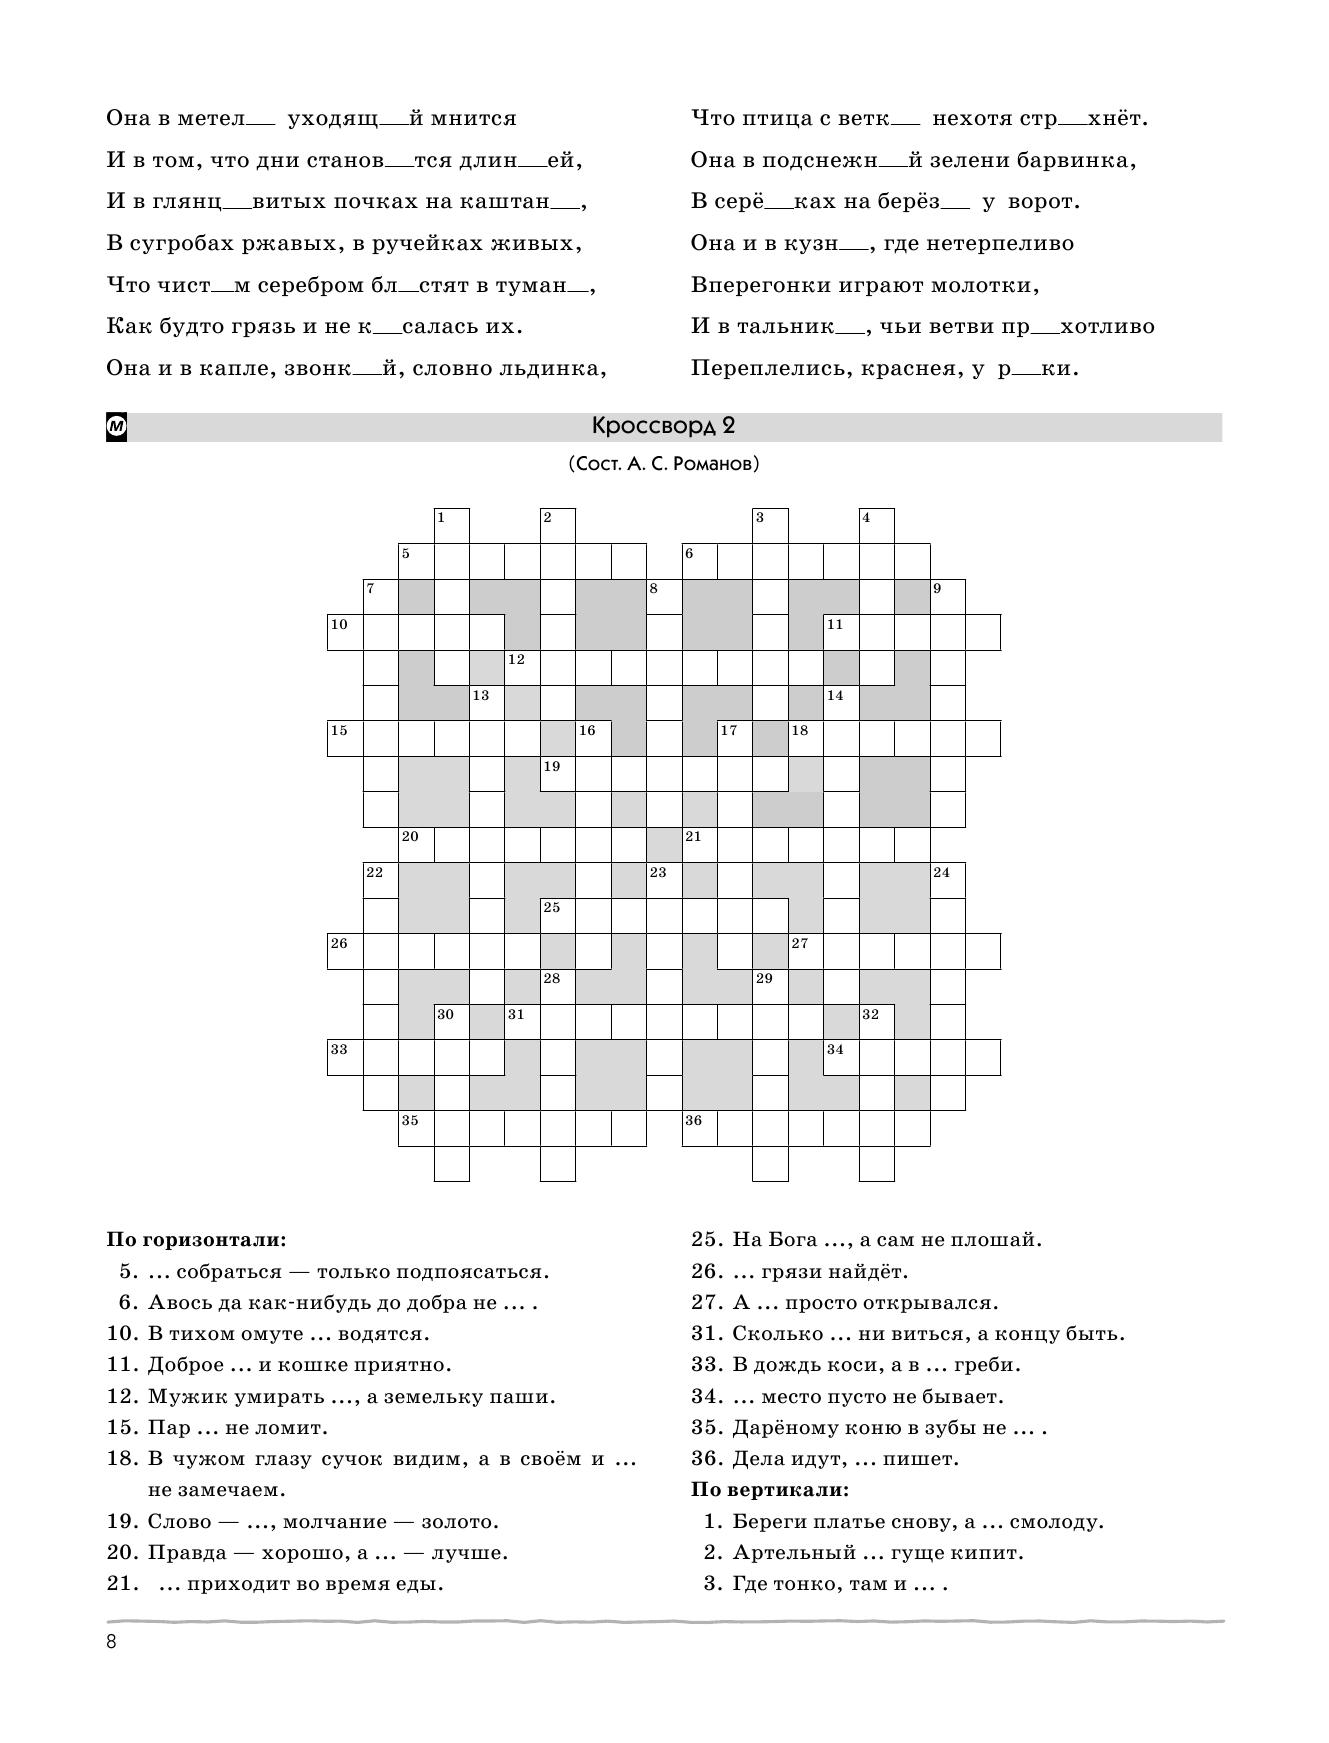 гдз по русскому языку 7 класс рабочая тетрадь бабайцева сергиенко